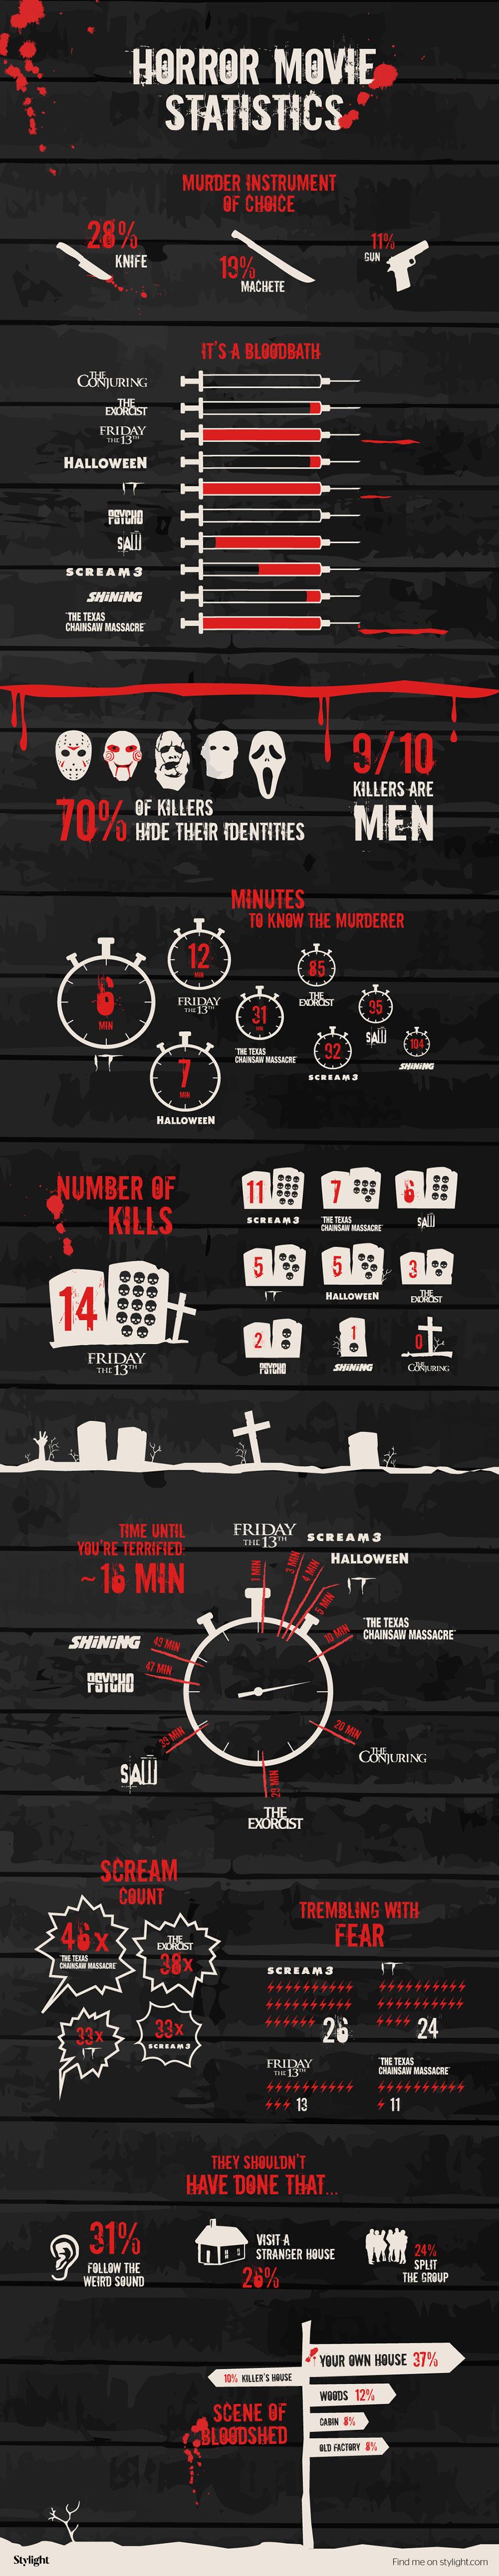 horror-movie-statistics-infographic-long